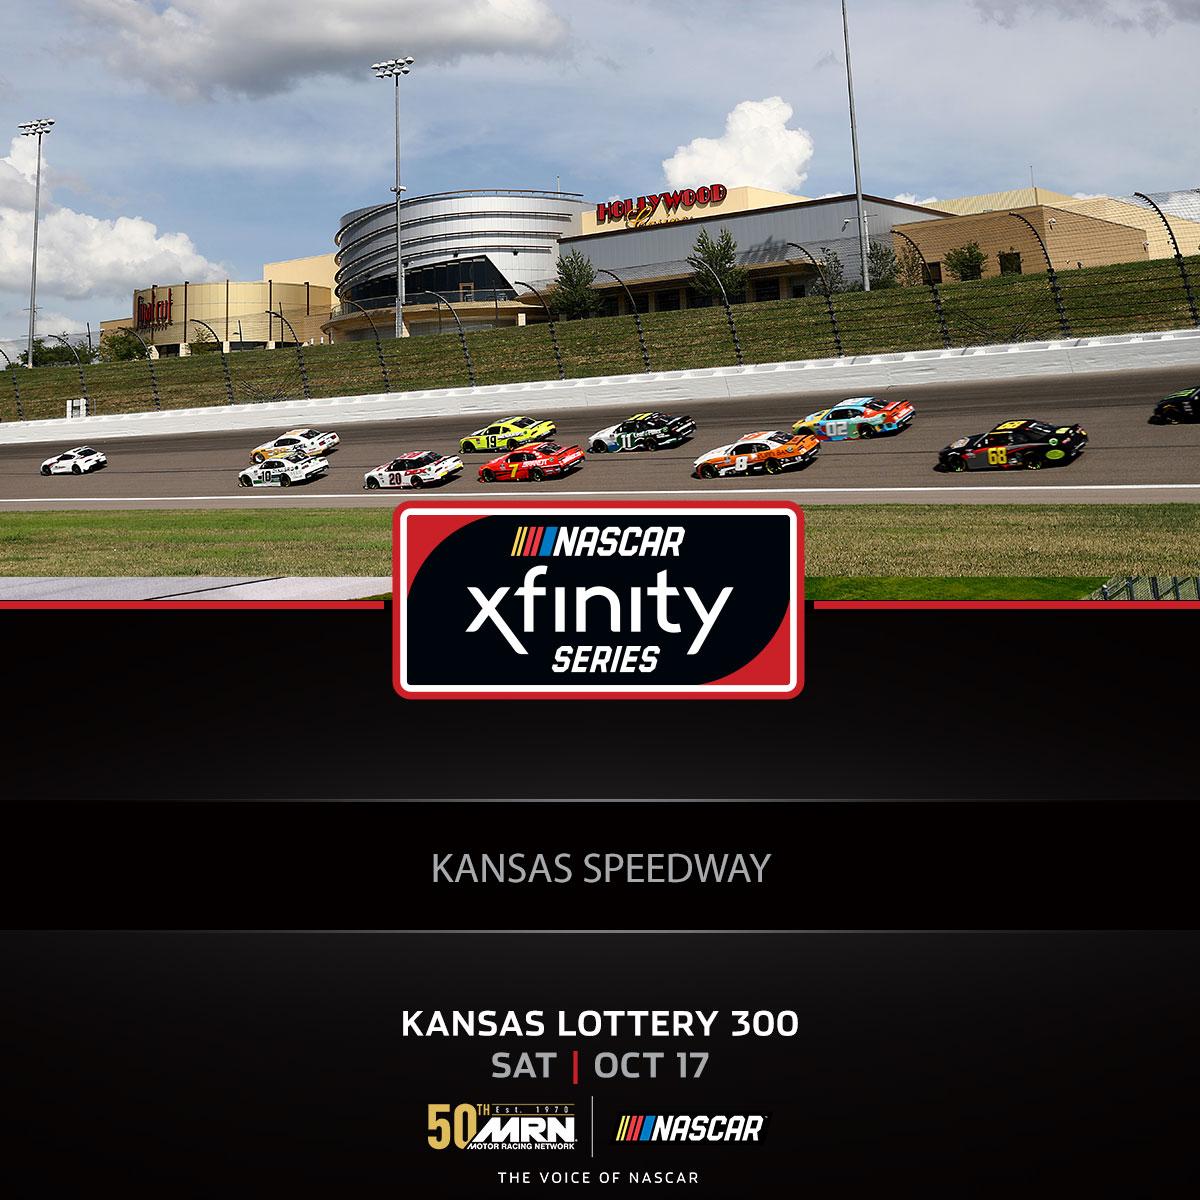 WE ARE LIVE @kansasspeedway for the #KSL300 📻: Local Affiliate: bit.ly/2MfJ5XI 💻: bit.ly/MRNbroadcast #NASCAR Mobile 📱:nas.cr/2qeyRNK @SIRIUSXM Channel 90 @REradioz Scanner: 454.000 #AskMRN | #NASCARPlayoffs